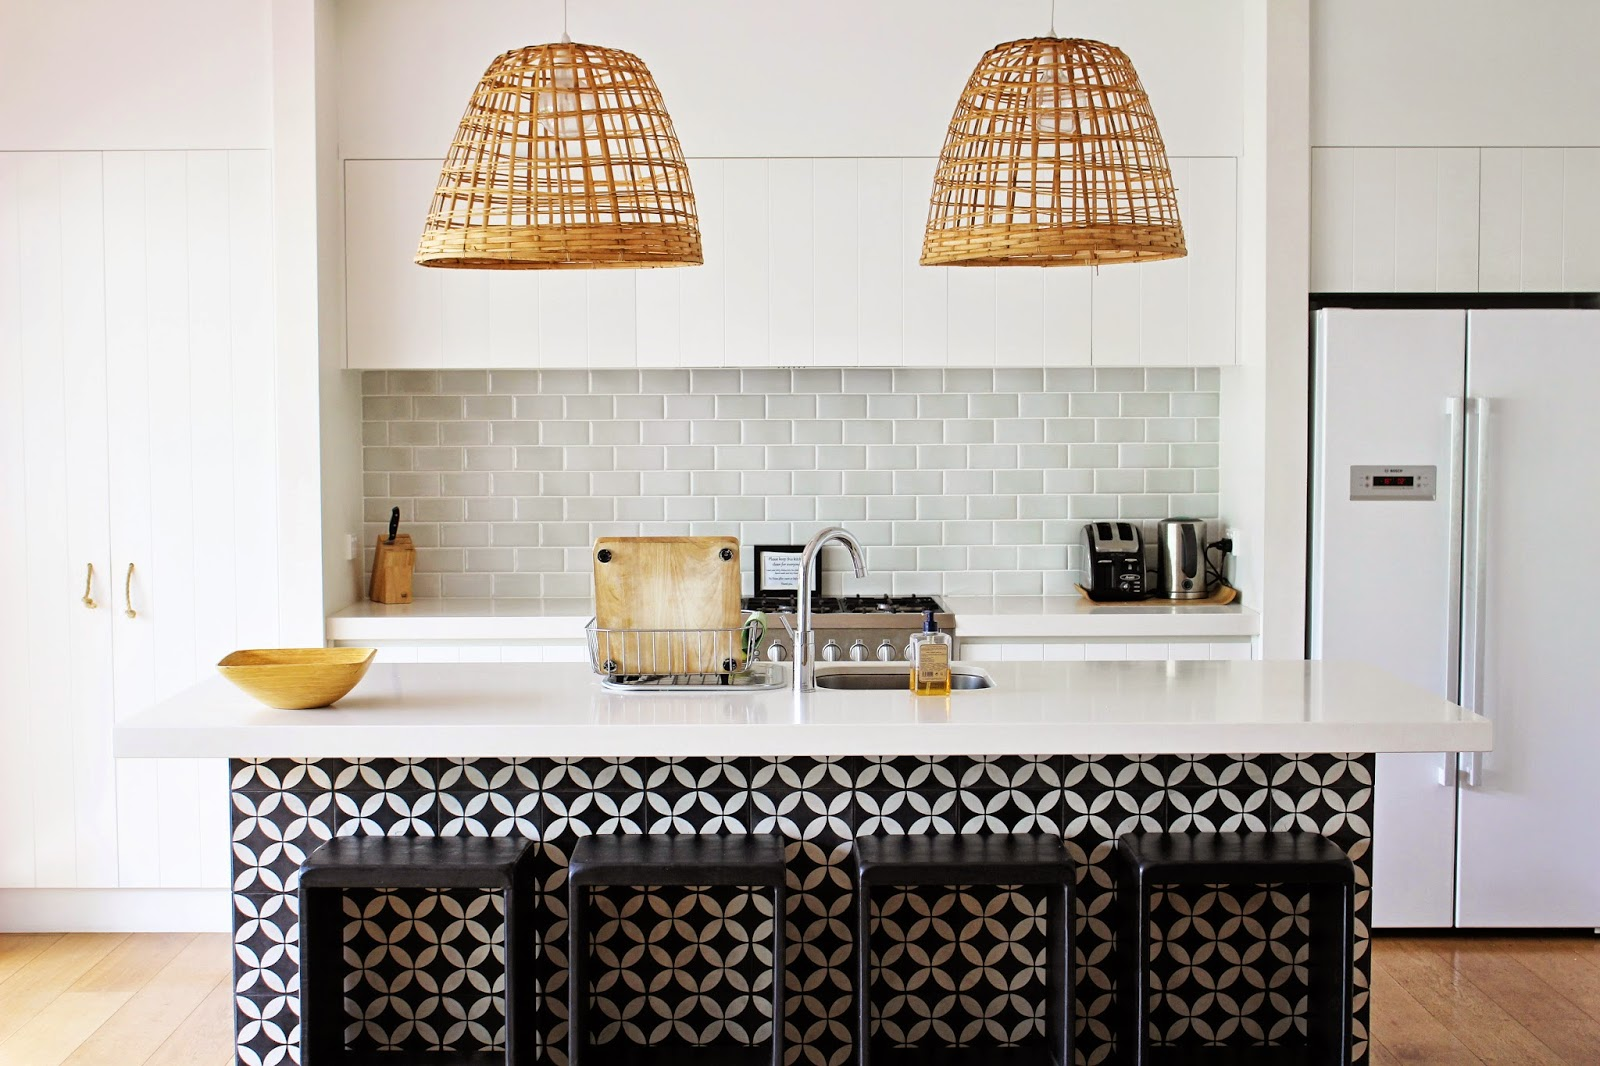 Beyond Kitchen Tile and Bathroom Tile: Use Granada Tile Cement Tile ...